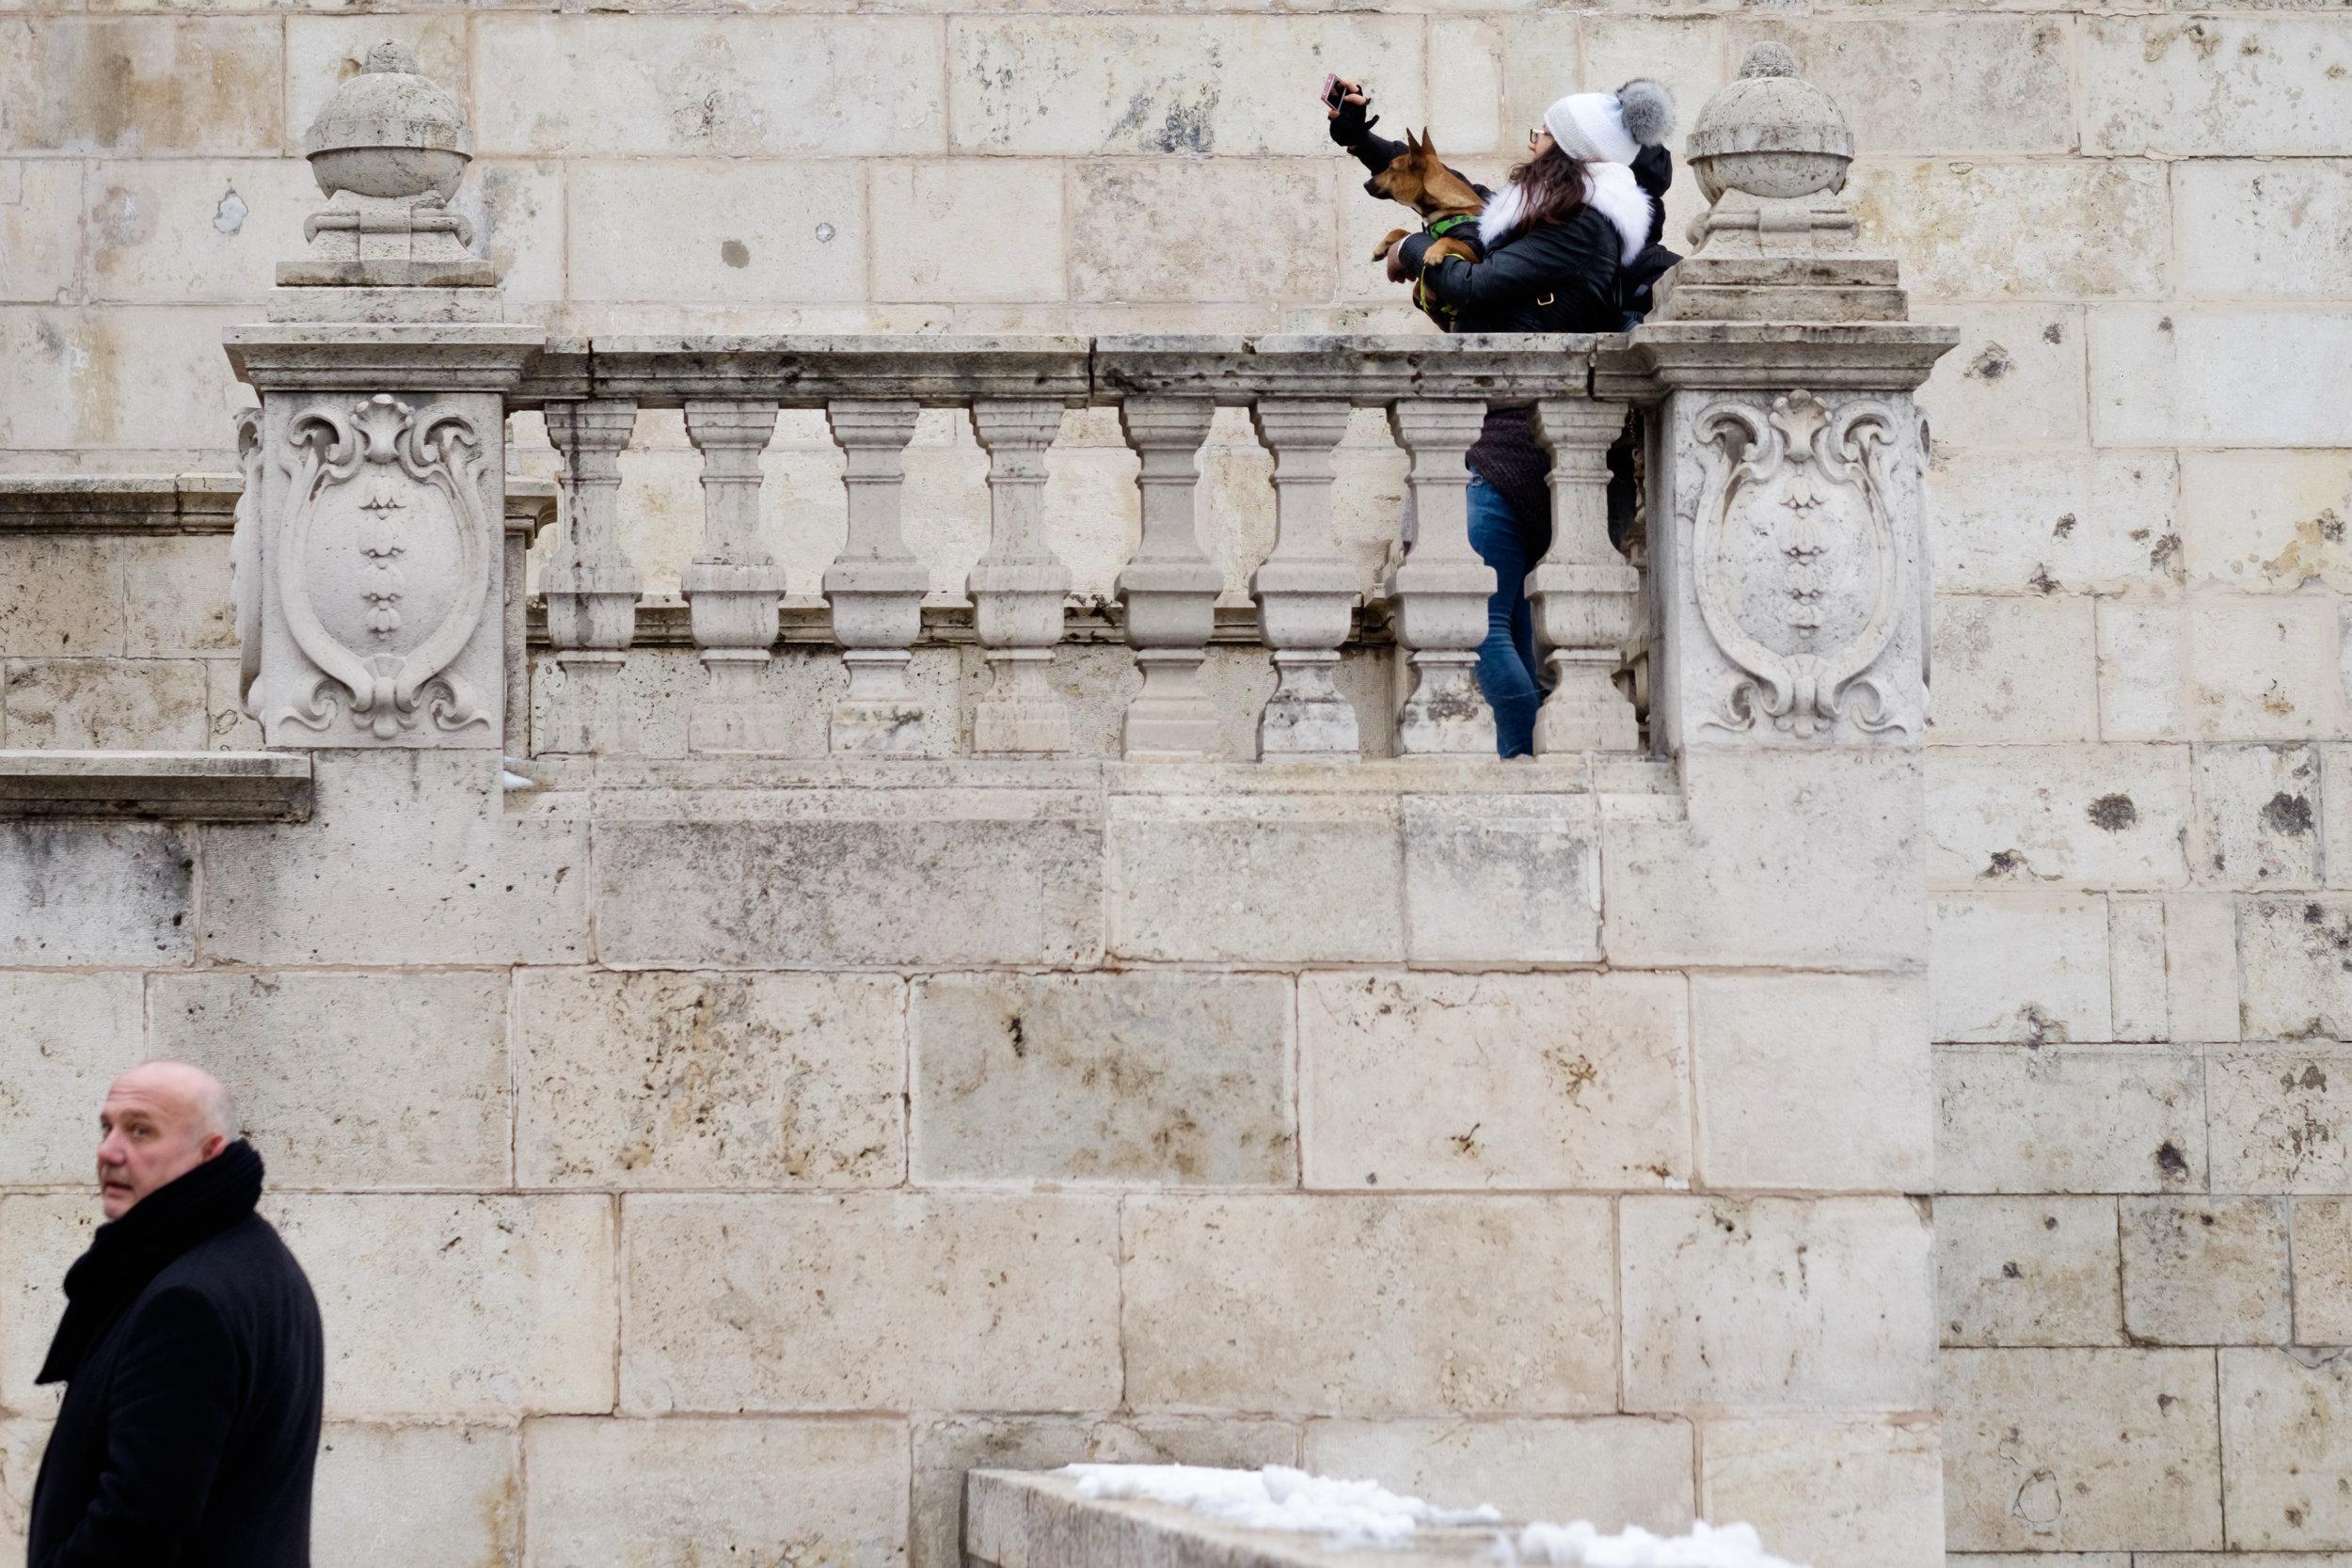 Budapest, Hungary : February 2018